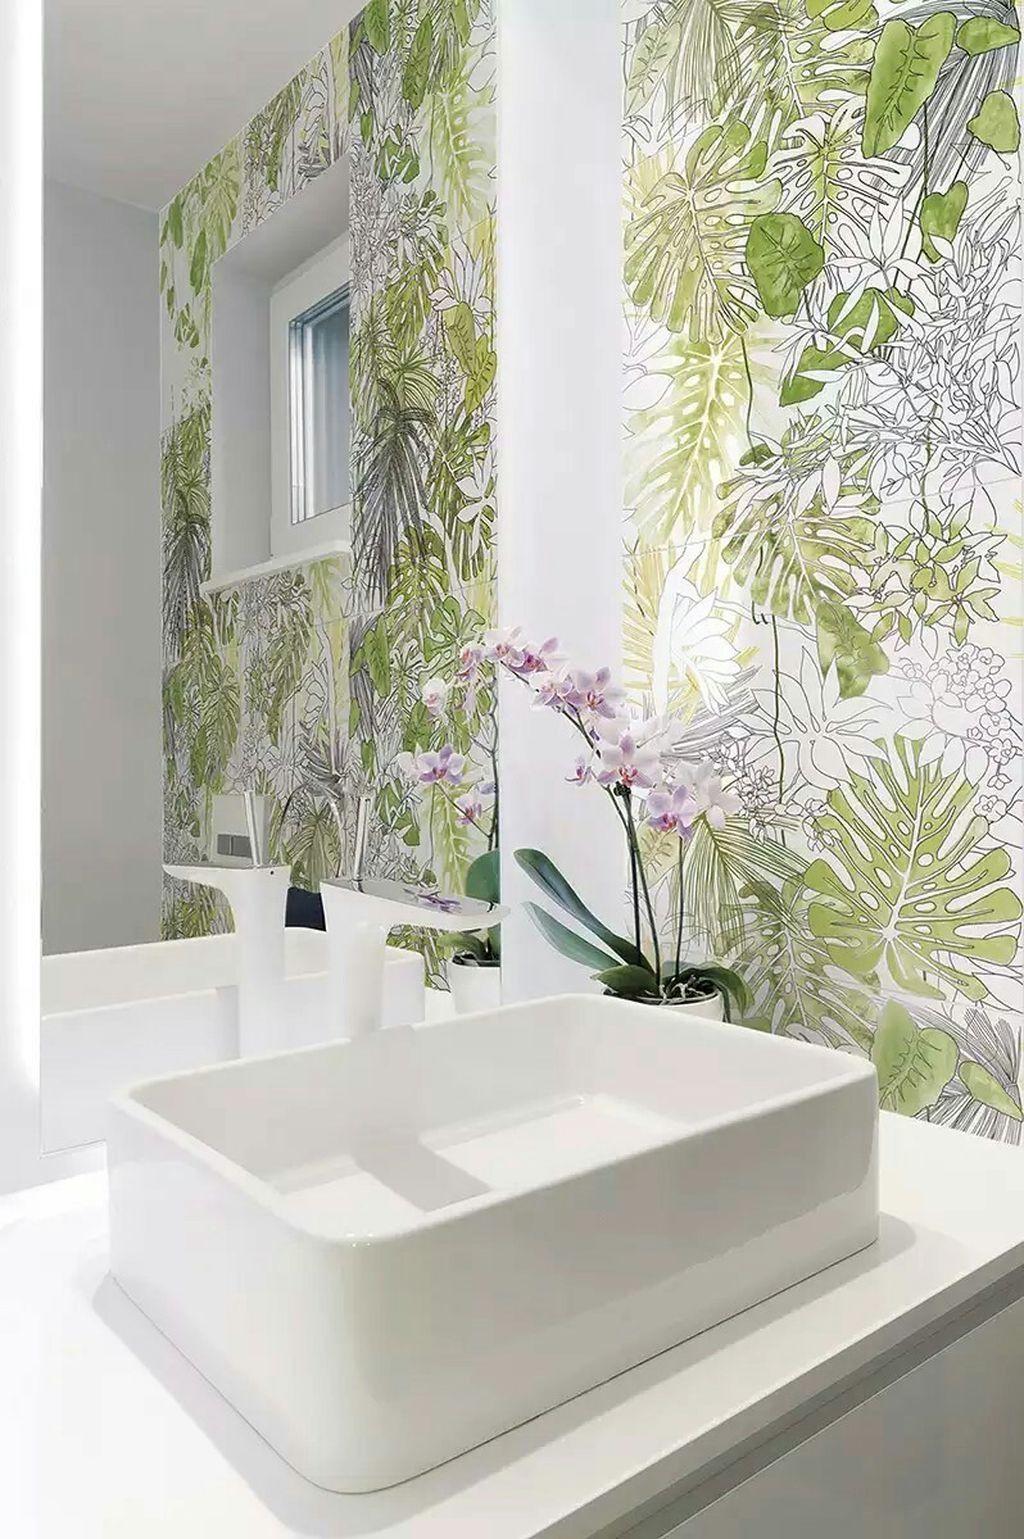 50 Trending 2018 Jungle Bathroom Design Ideas | Pinterest | Jungle ...